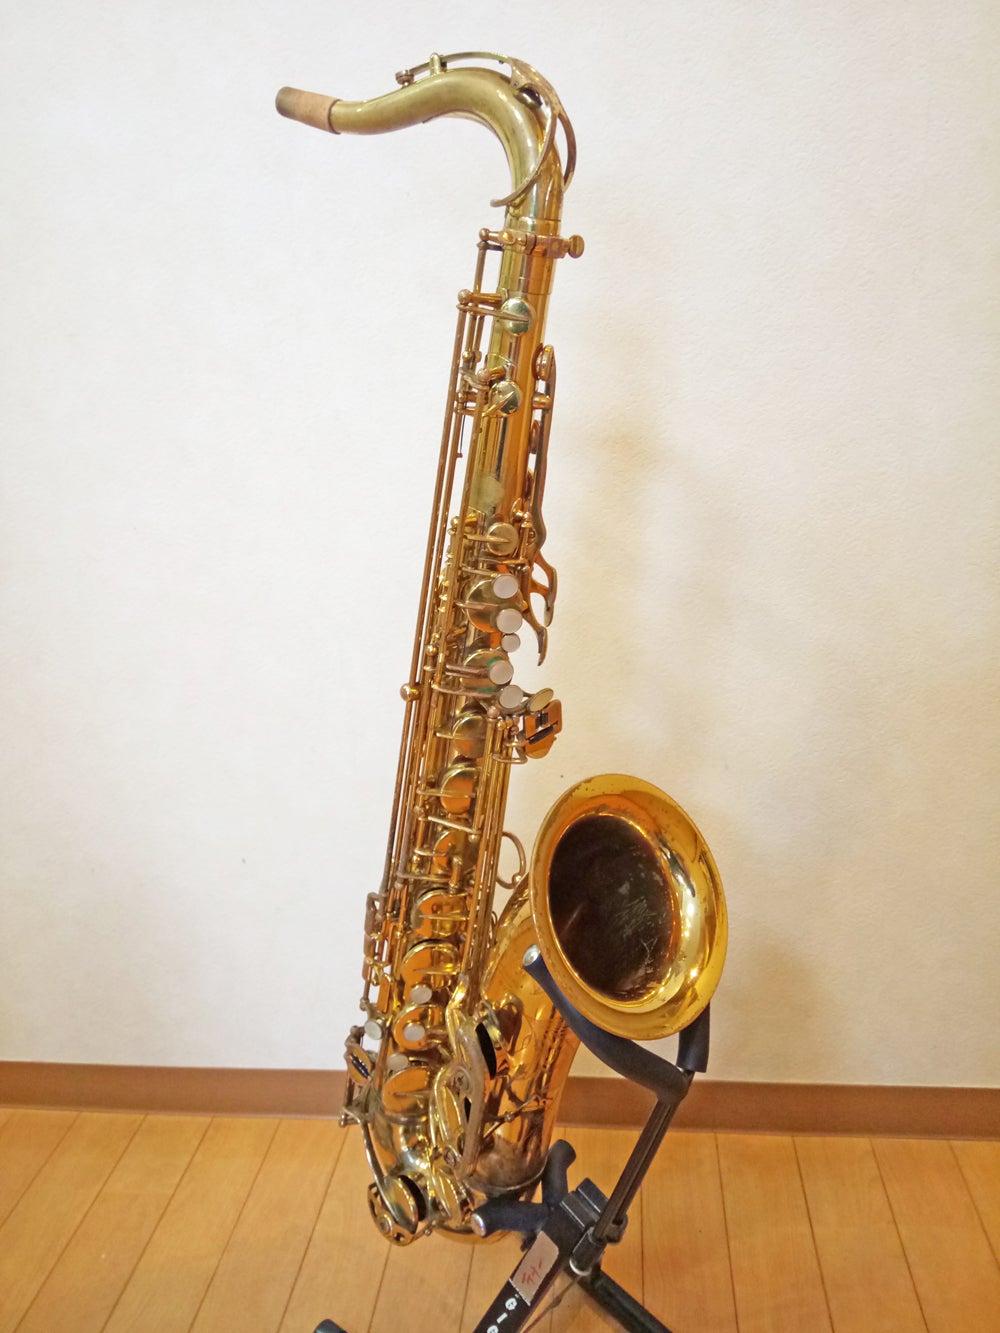 C.G.Conn 6m Naked Lady Ⅷ Stamp Alto Sax 29万1千台 ( 楽器 ) - ジャズ